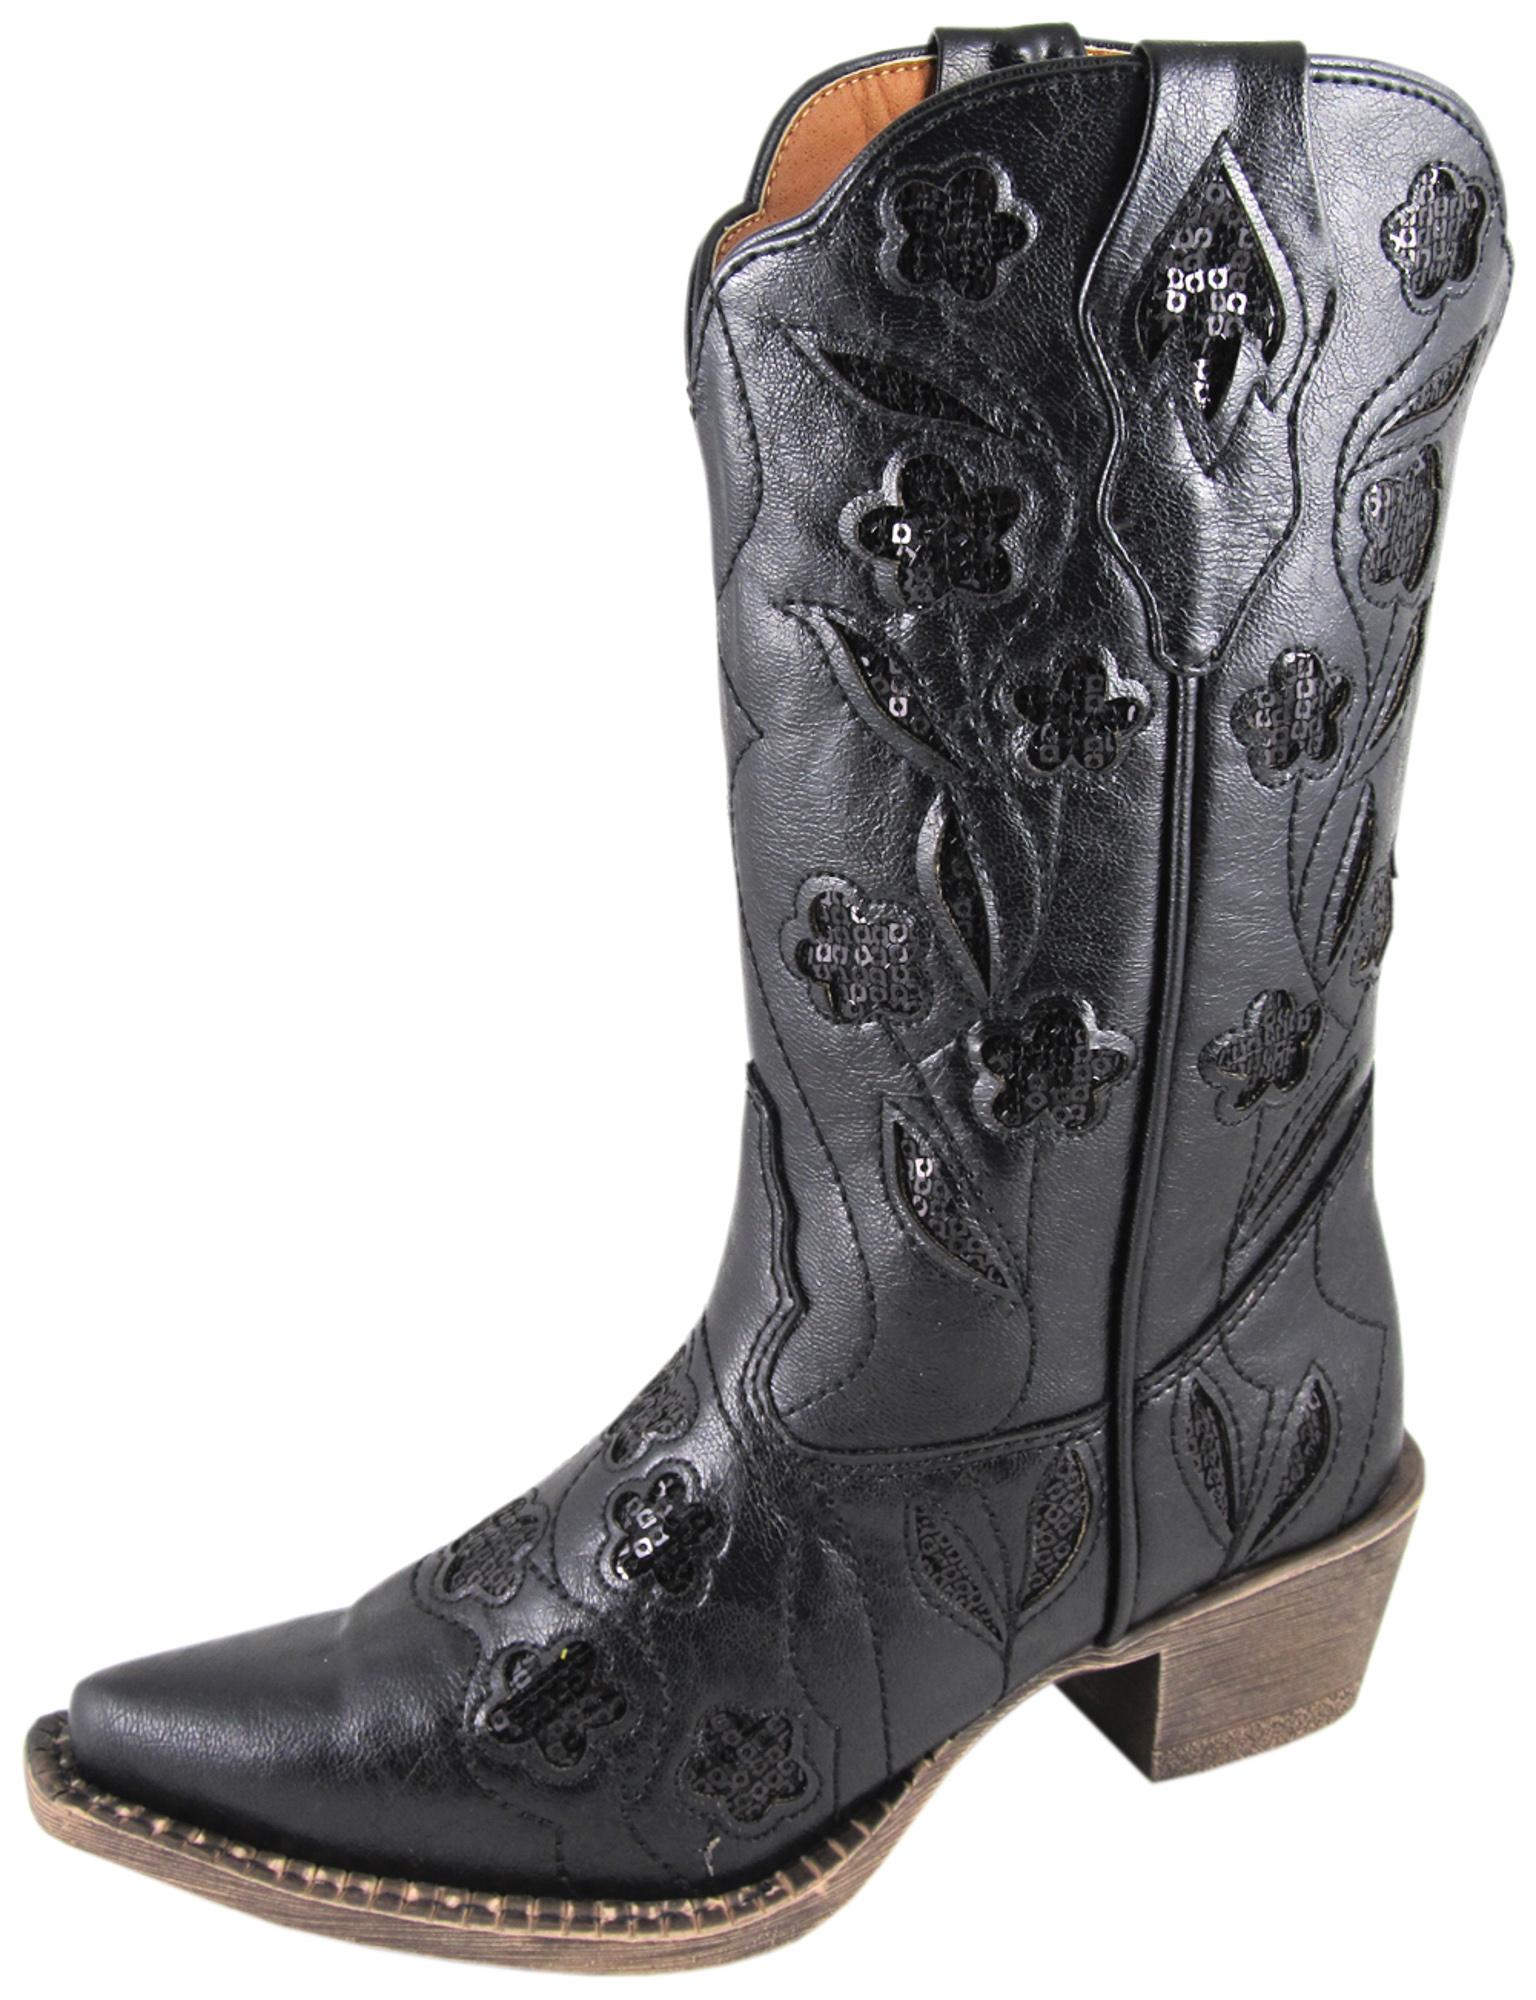 smoky mountain boots children black faux